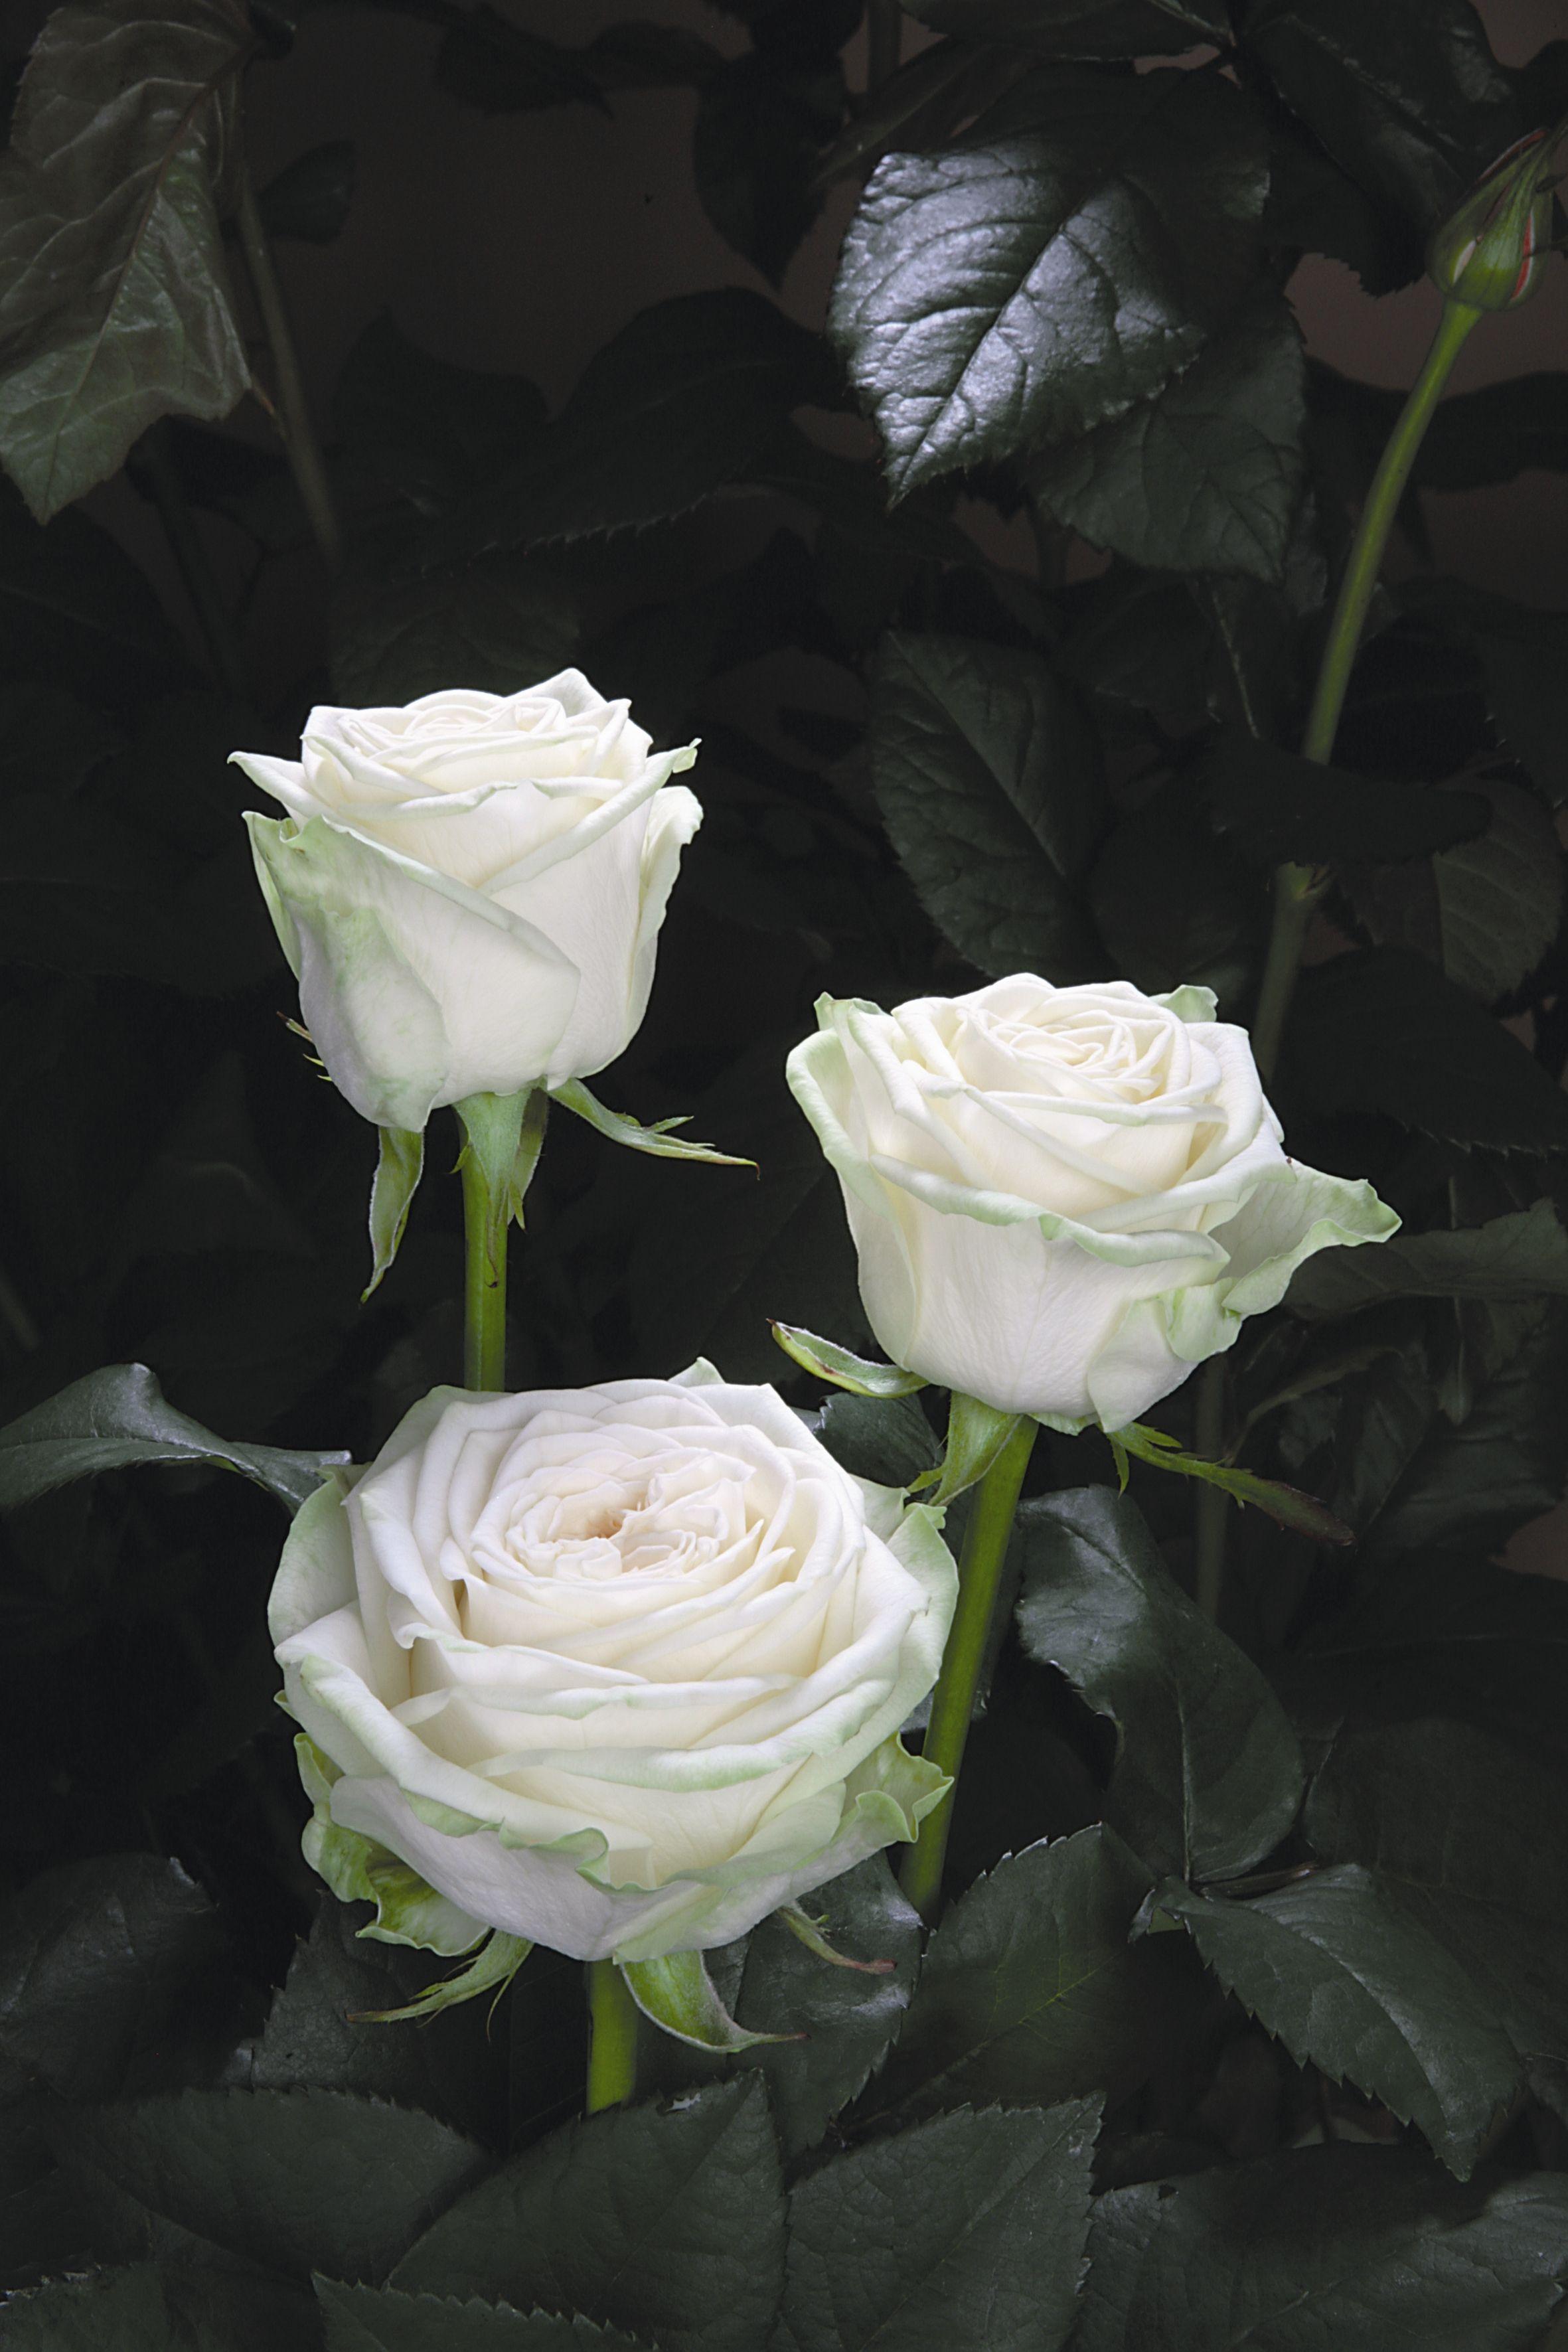 Floribunda rose 'Juwena', Rosen Tantau-Tan09716, Bred by Hans Jürgen Evers (Germany, 1988).   http://www.rosen-tantau.com/cms/index.php?article_id=544&clang=1